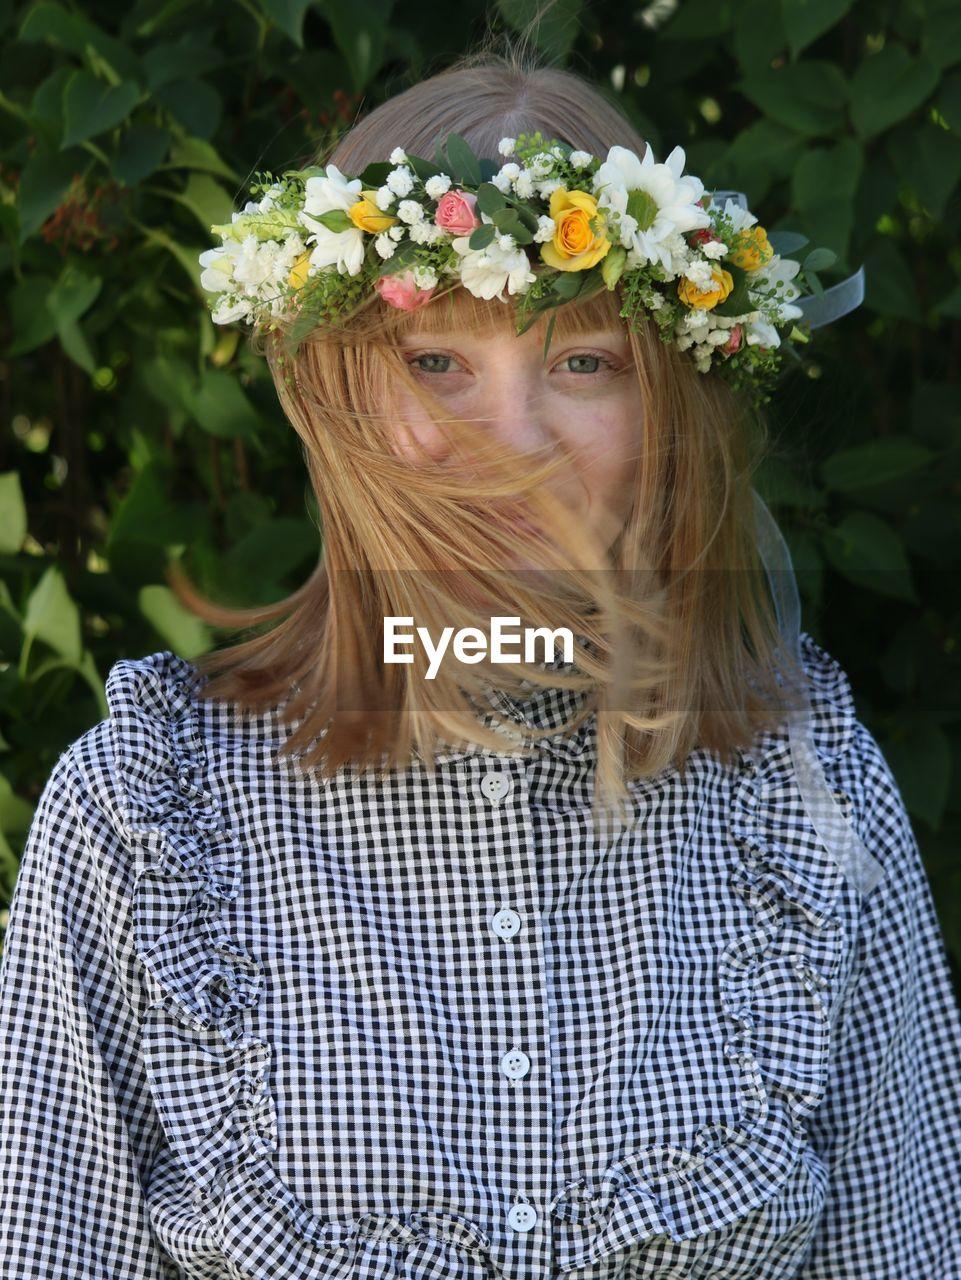 Portrait of woman wearing flowers standing against plants in park